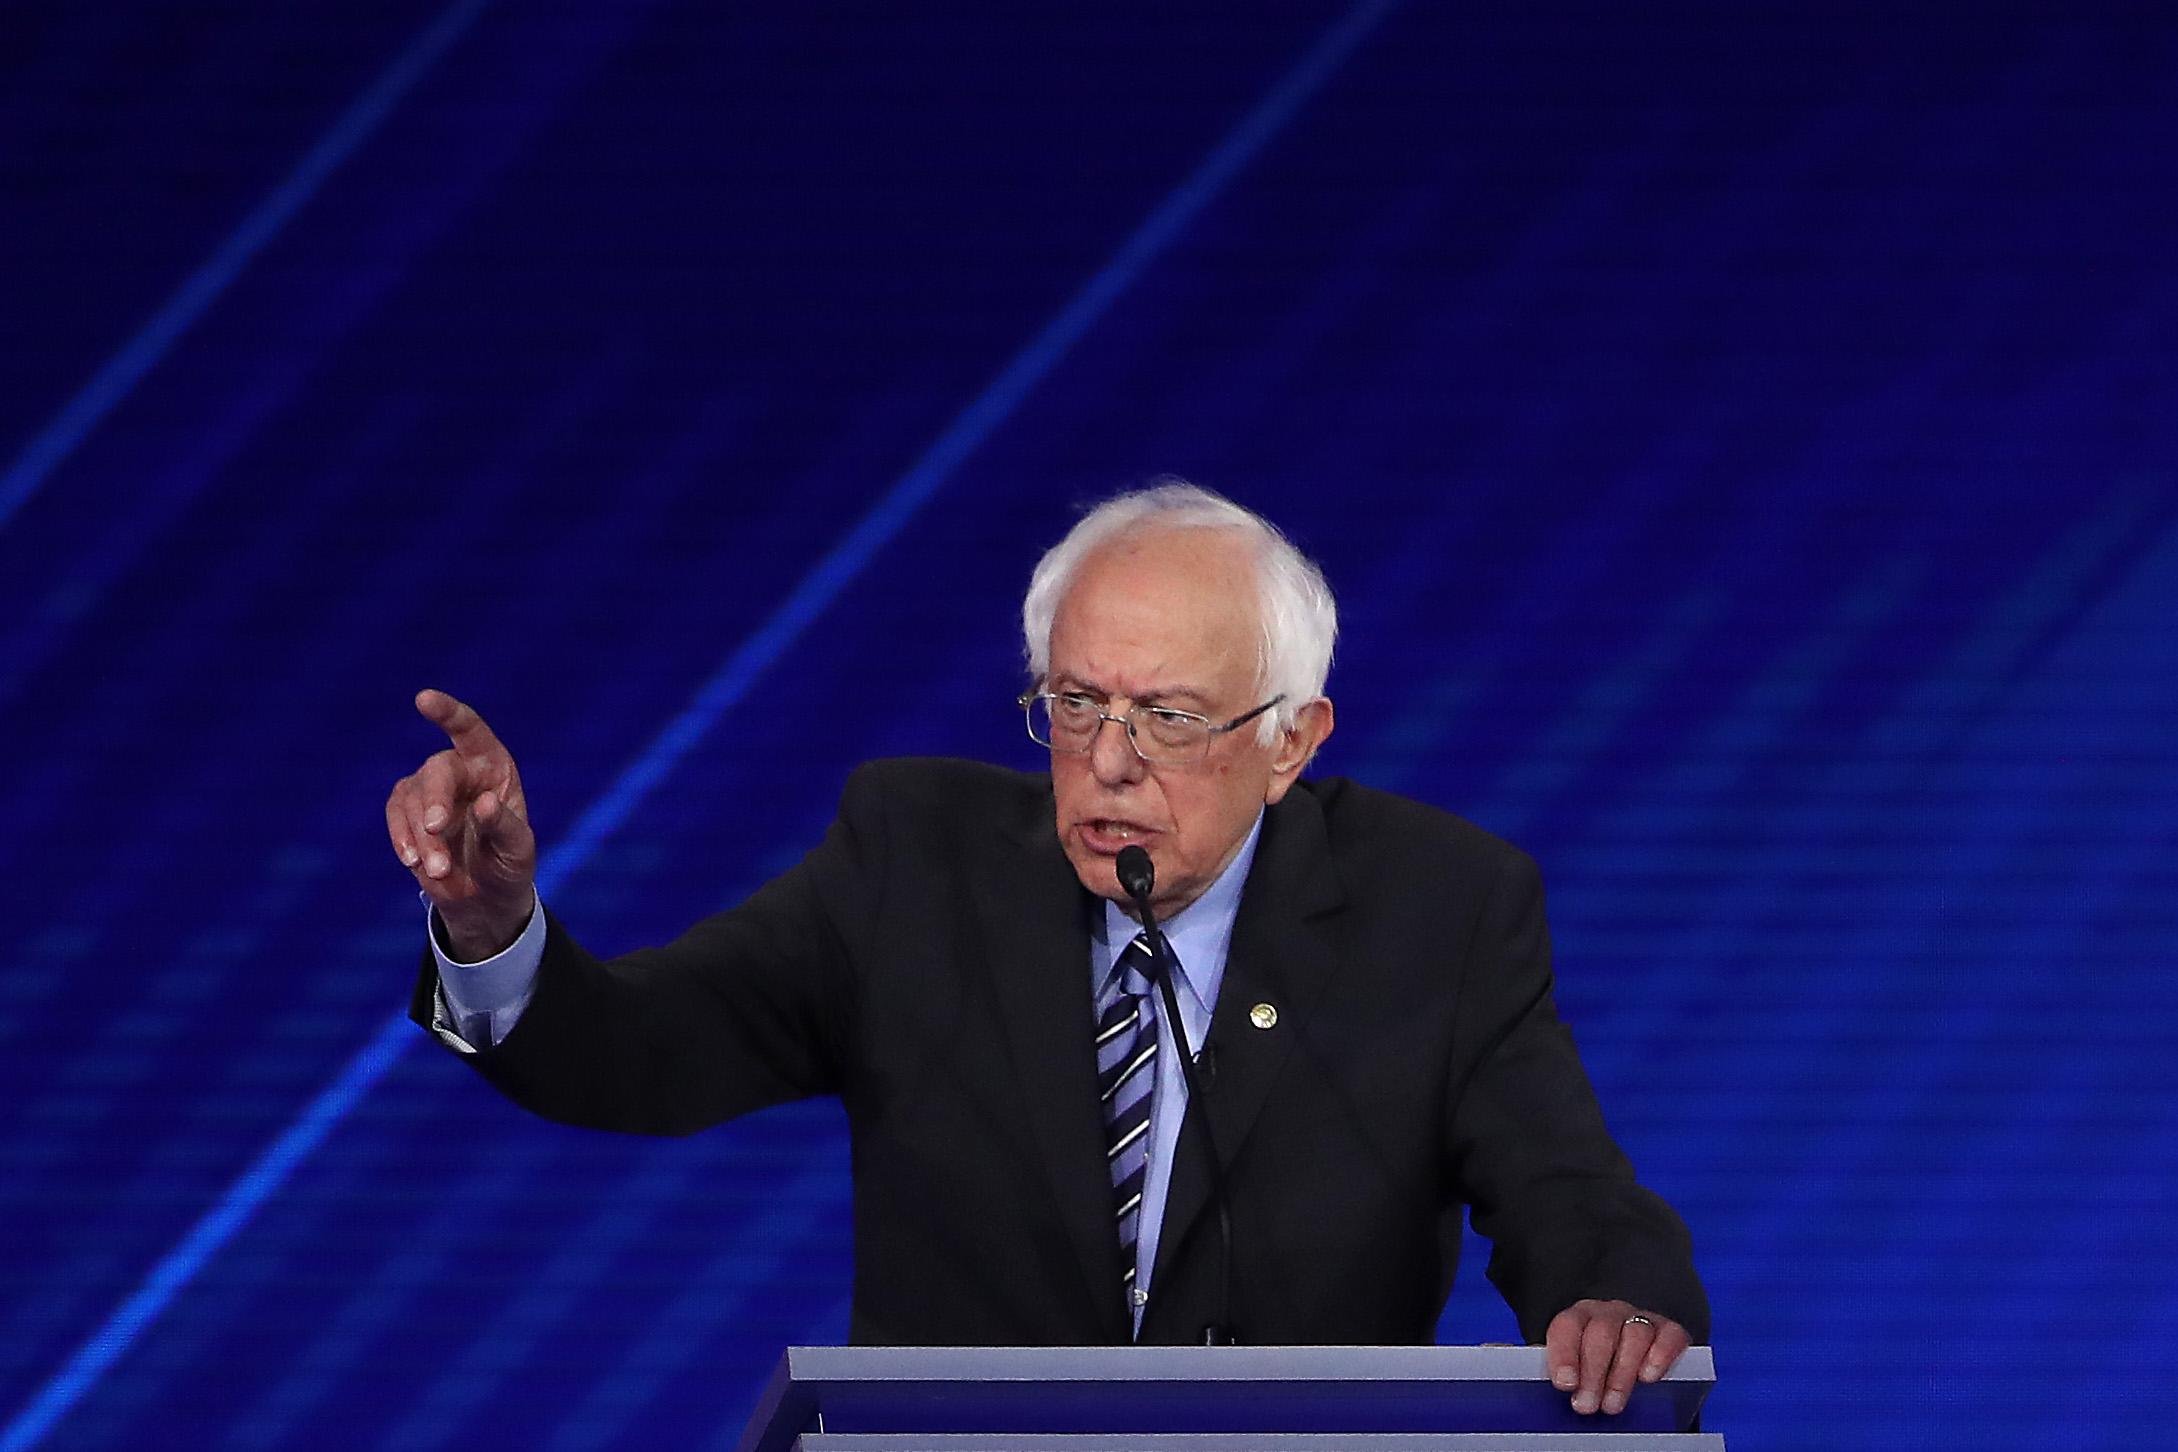 HOUSTON, TEXAS - SEPTEMBER 12: Democratic presidential candidate Sen. Bernie Sanders (I-VT) speaks during the Democratic Presidential Debate at Texas Southern University's Health and PE Center on September 12, 2019 in Houston, Texas. (Win McNamee/Getty Images)